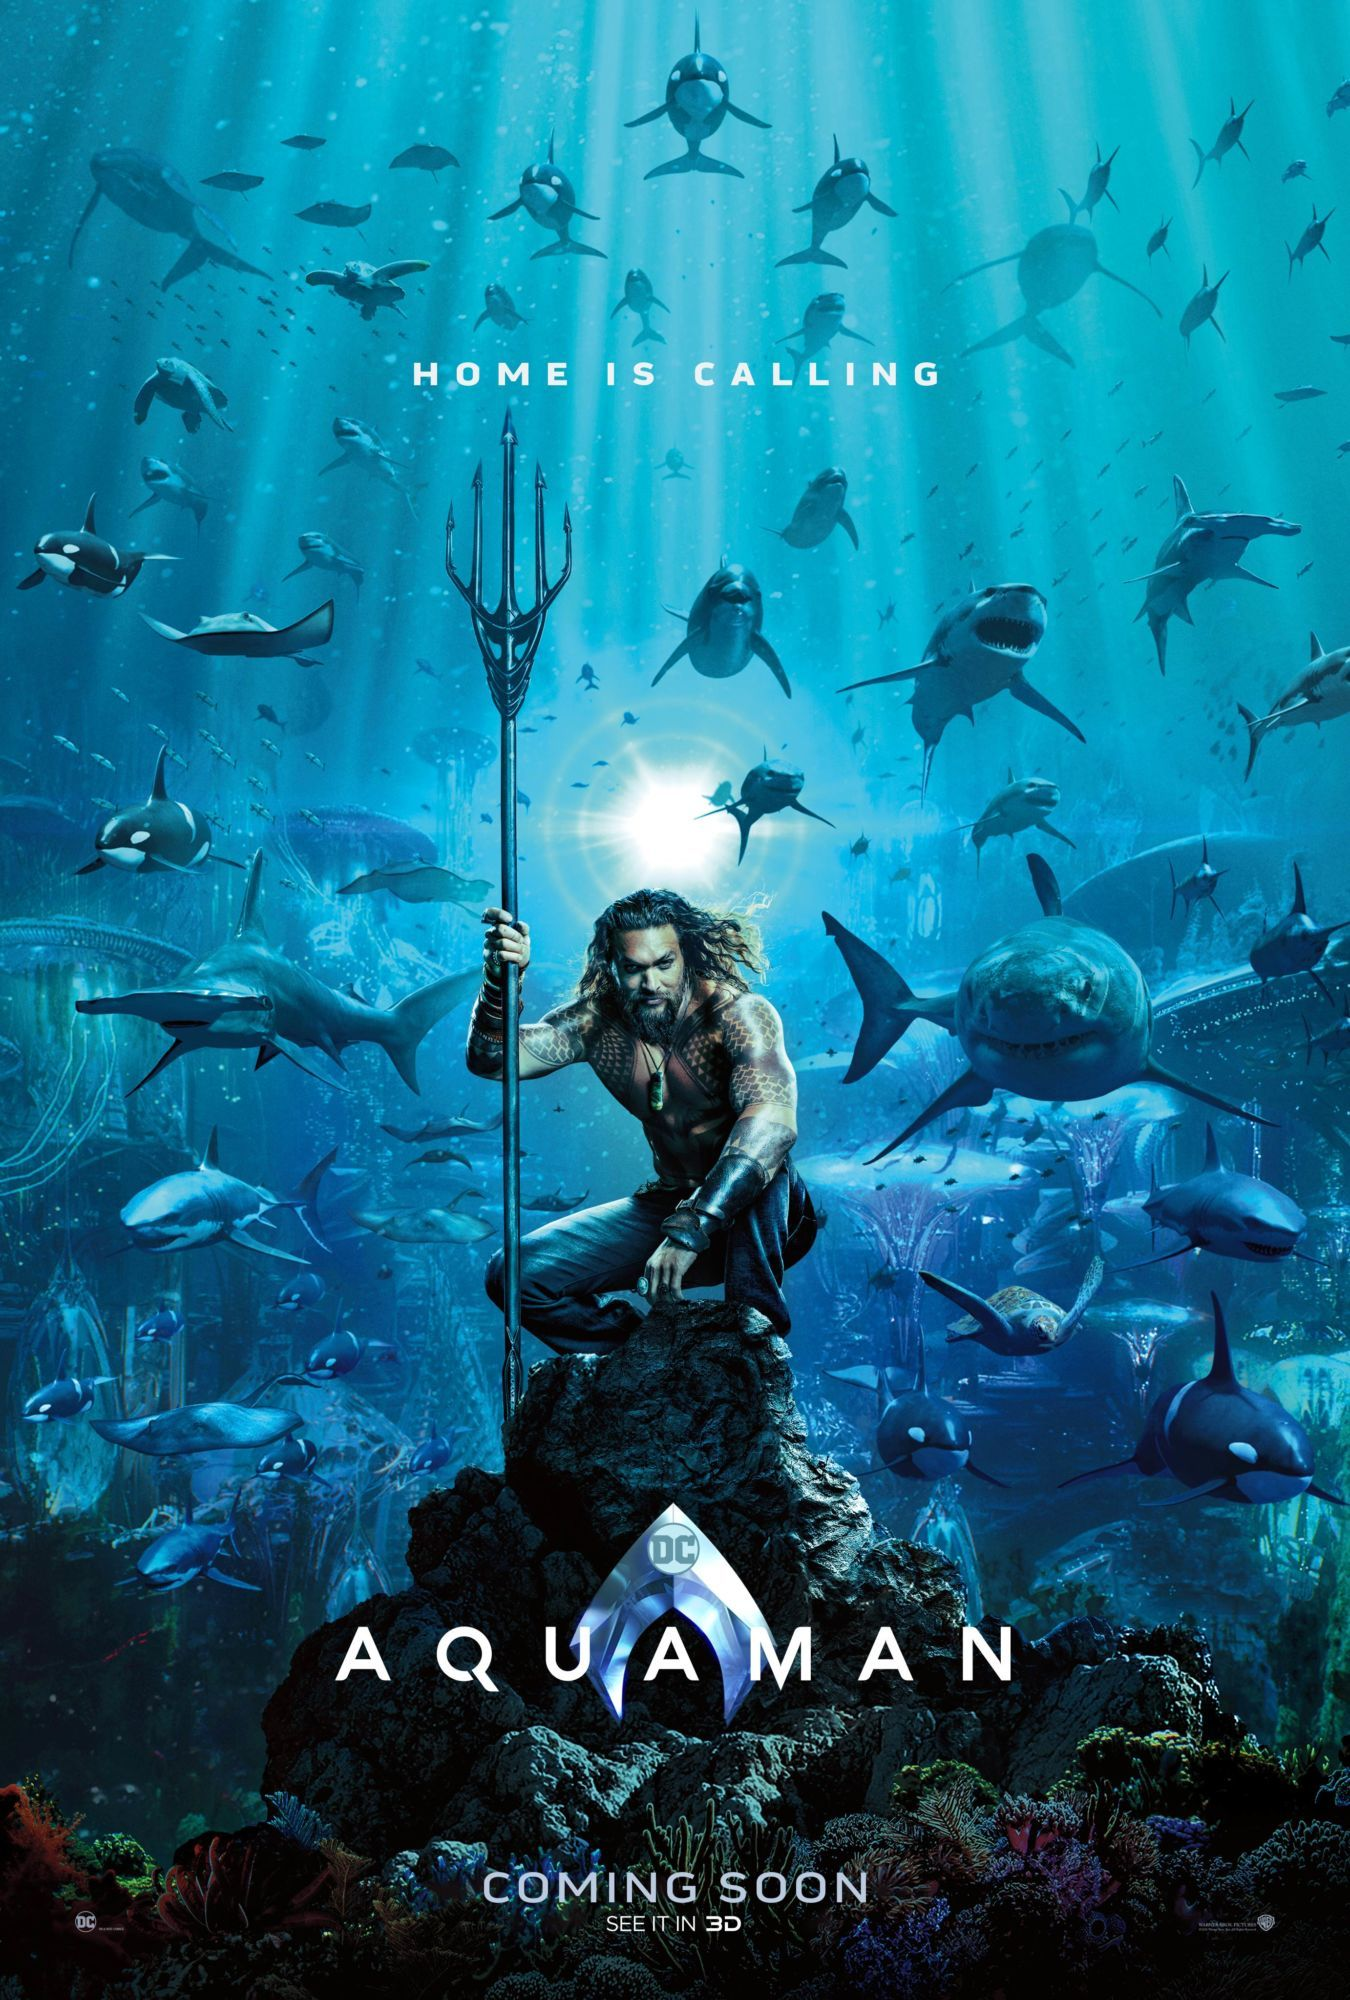 aquaman teaser poster sdcc 2018